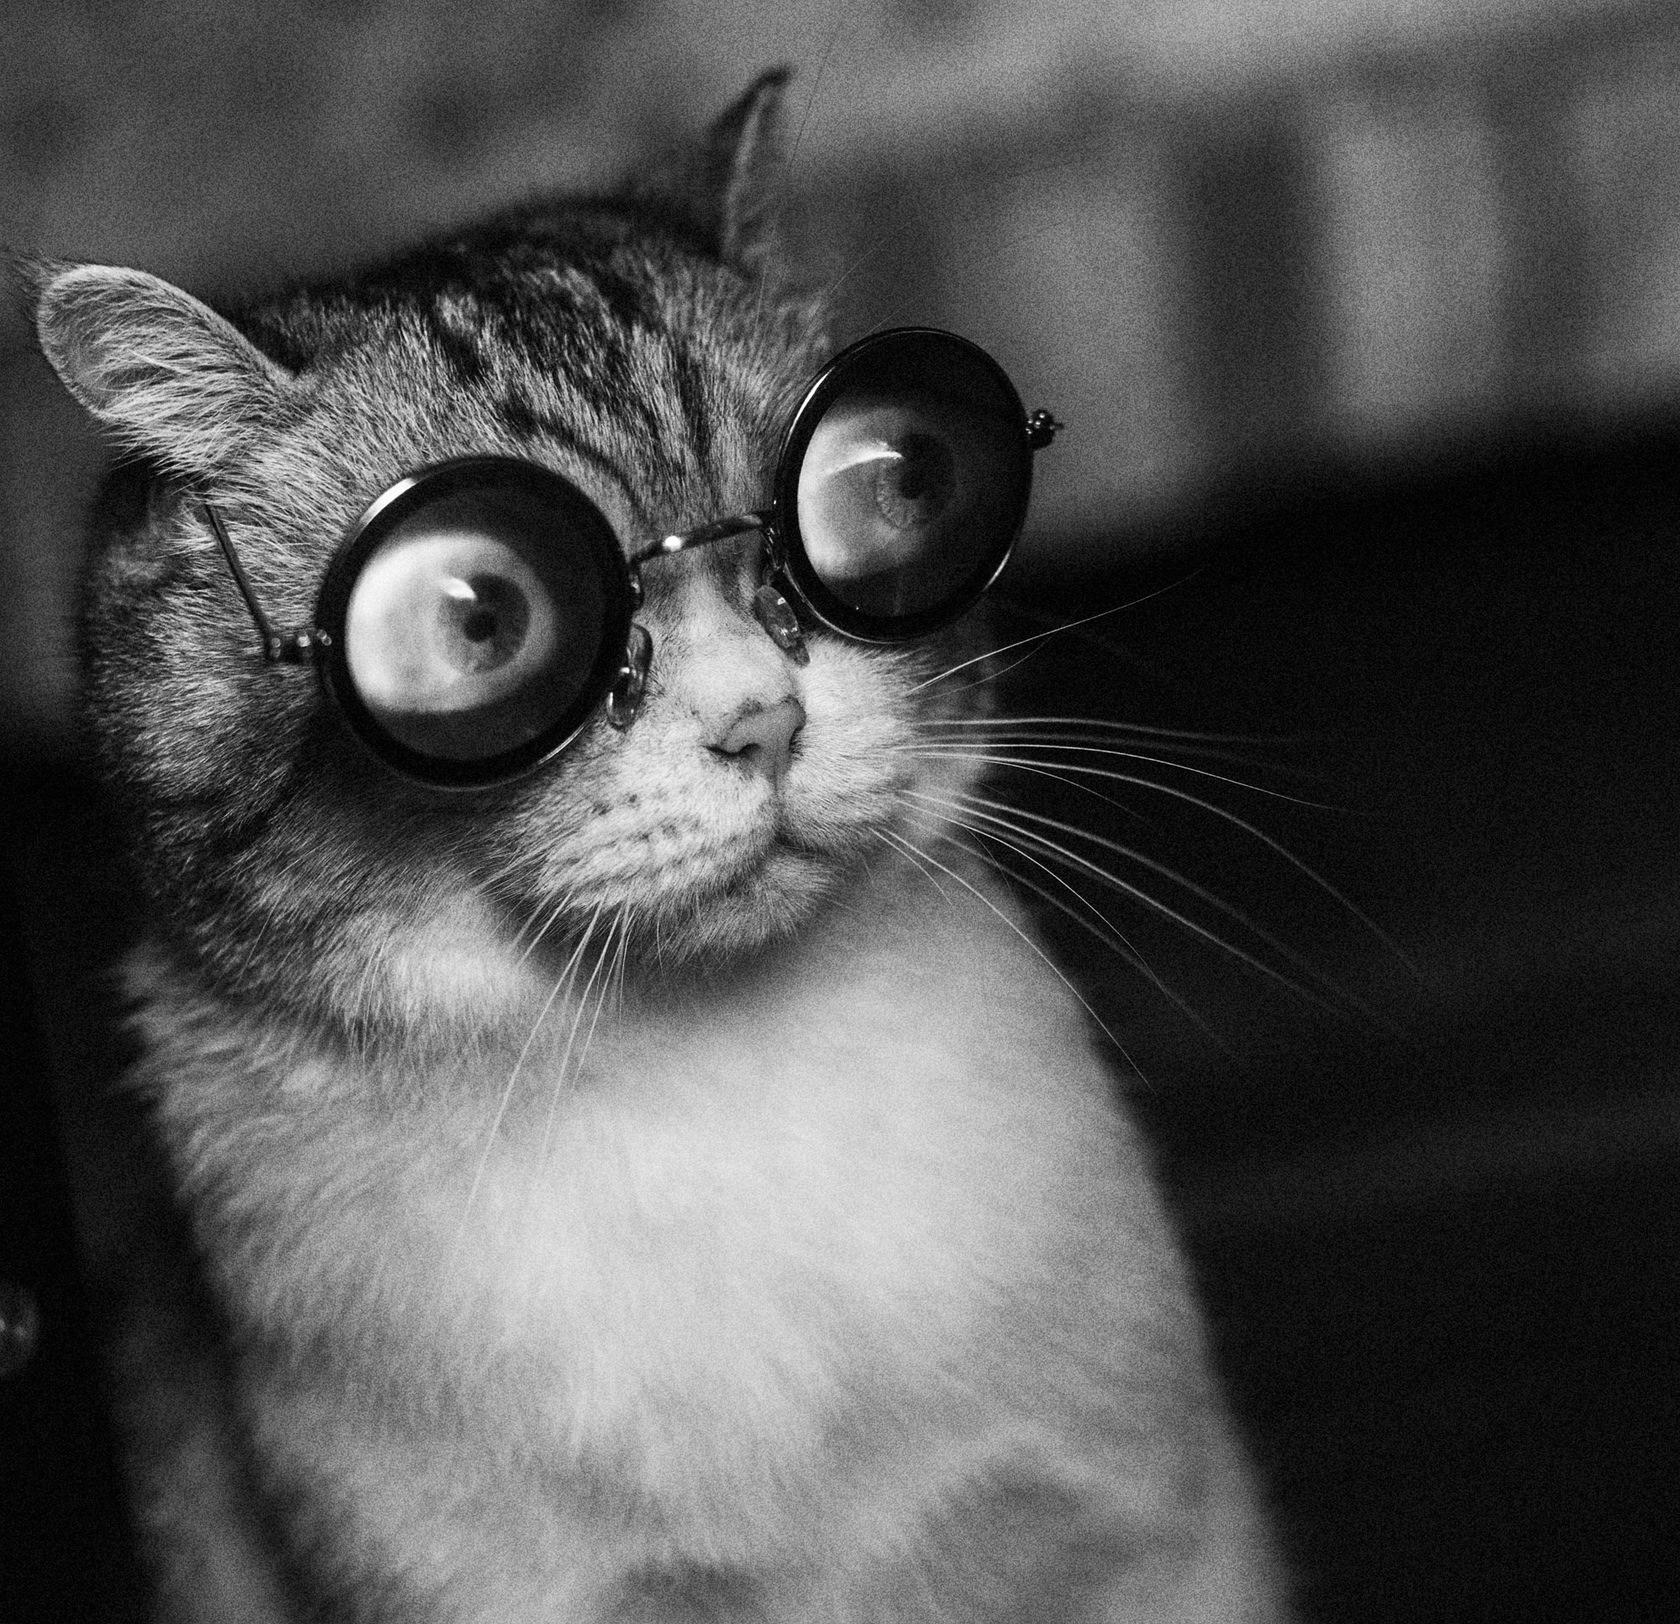 Картинки на аву с смешные кошки